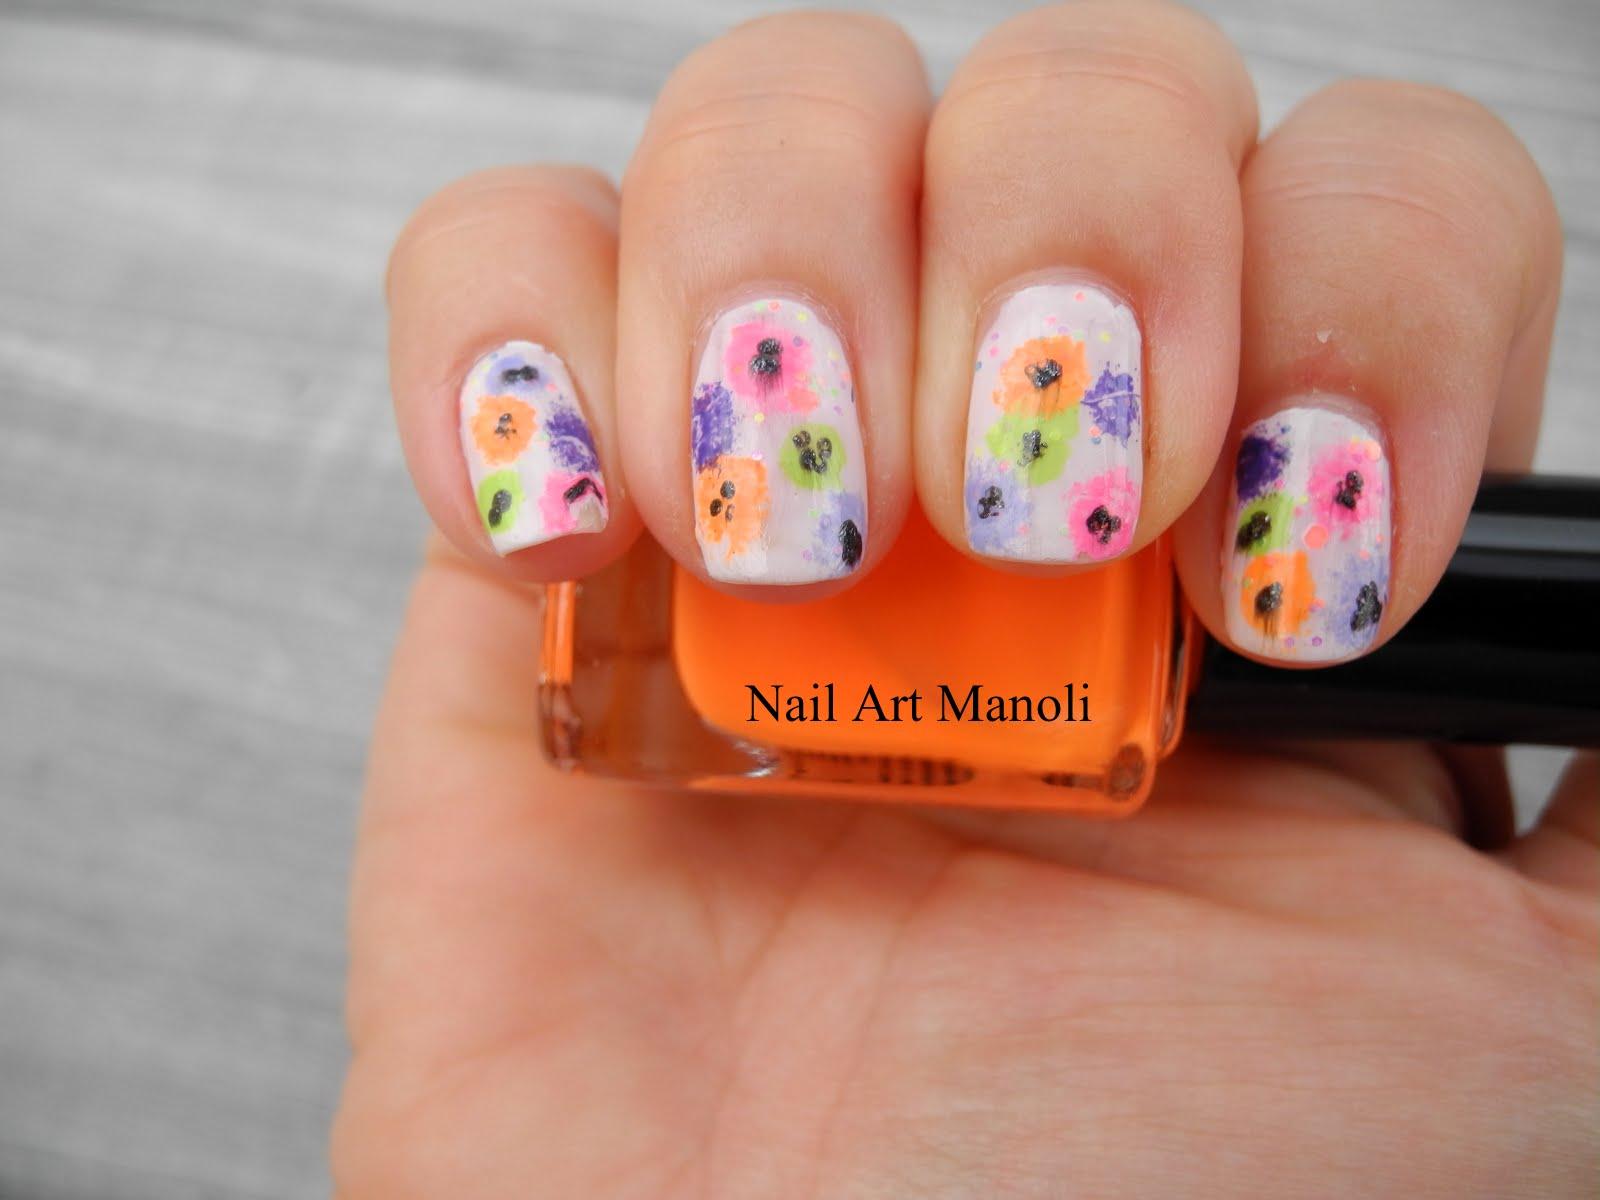 Nail Art Manoli: Flores fáciles con mano alzada